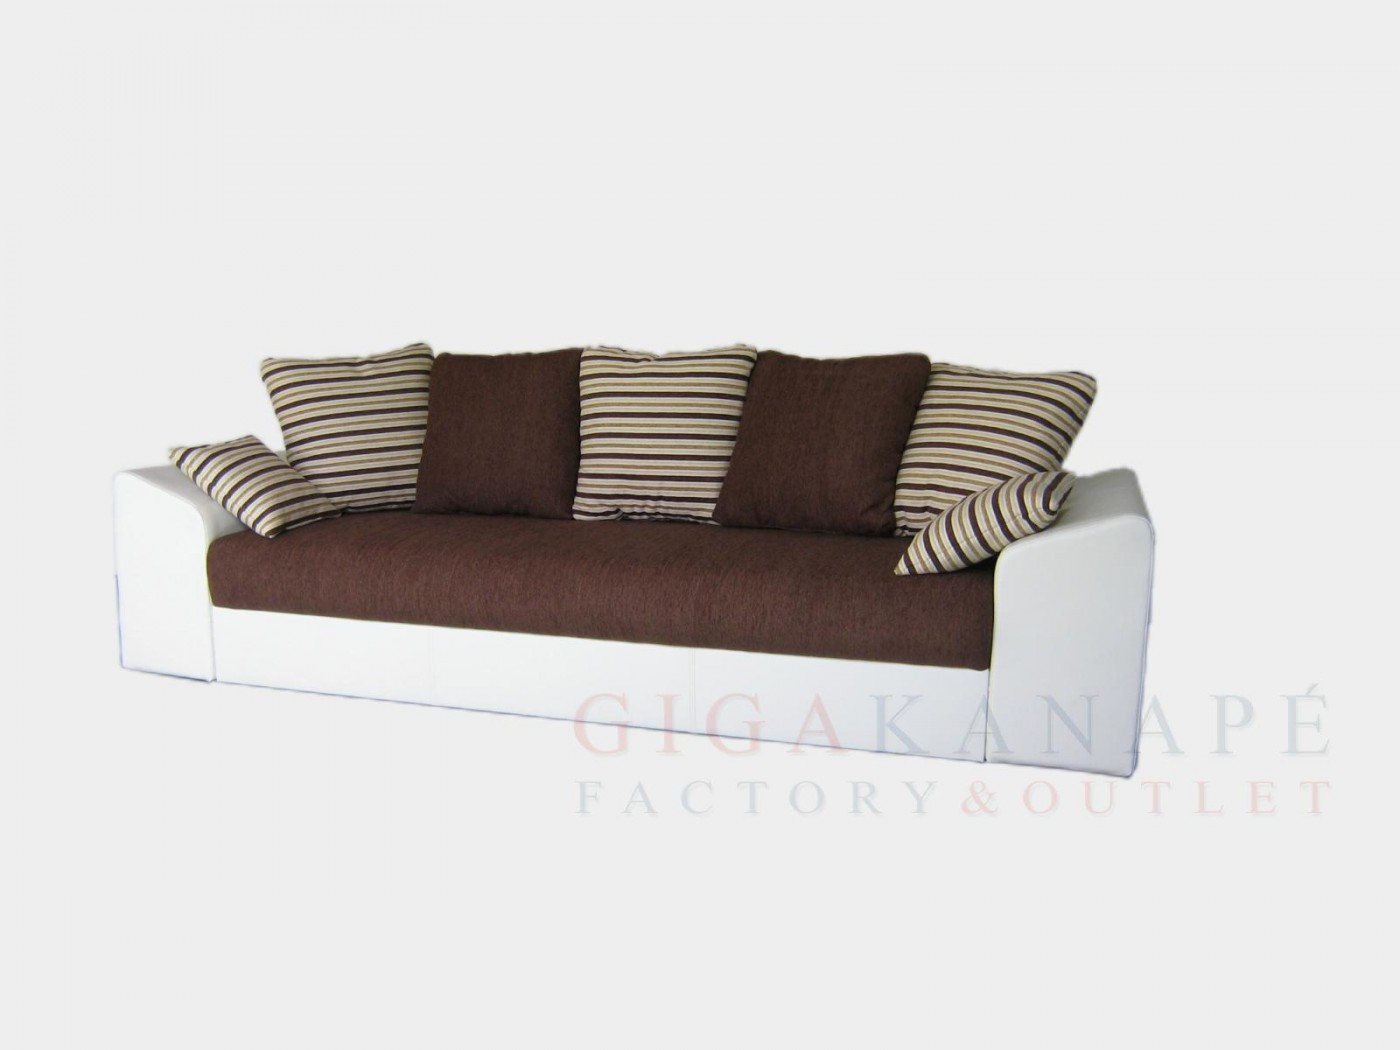 Dublin ágyneműtartós kanapéágy : GigaKanapé